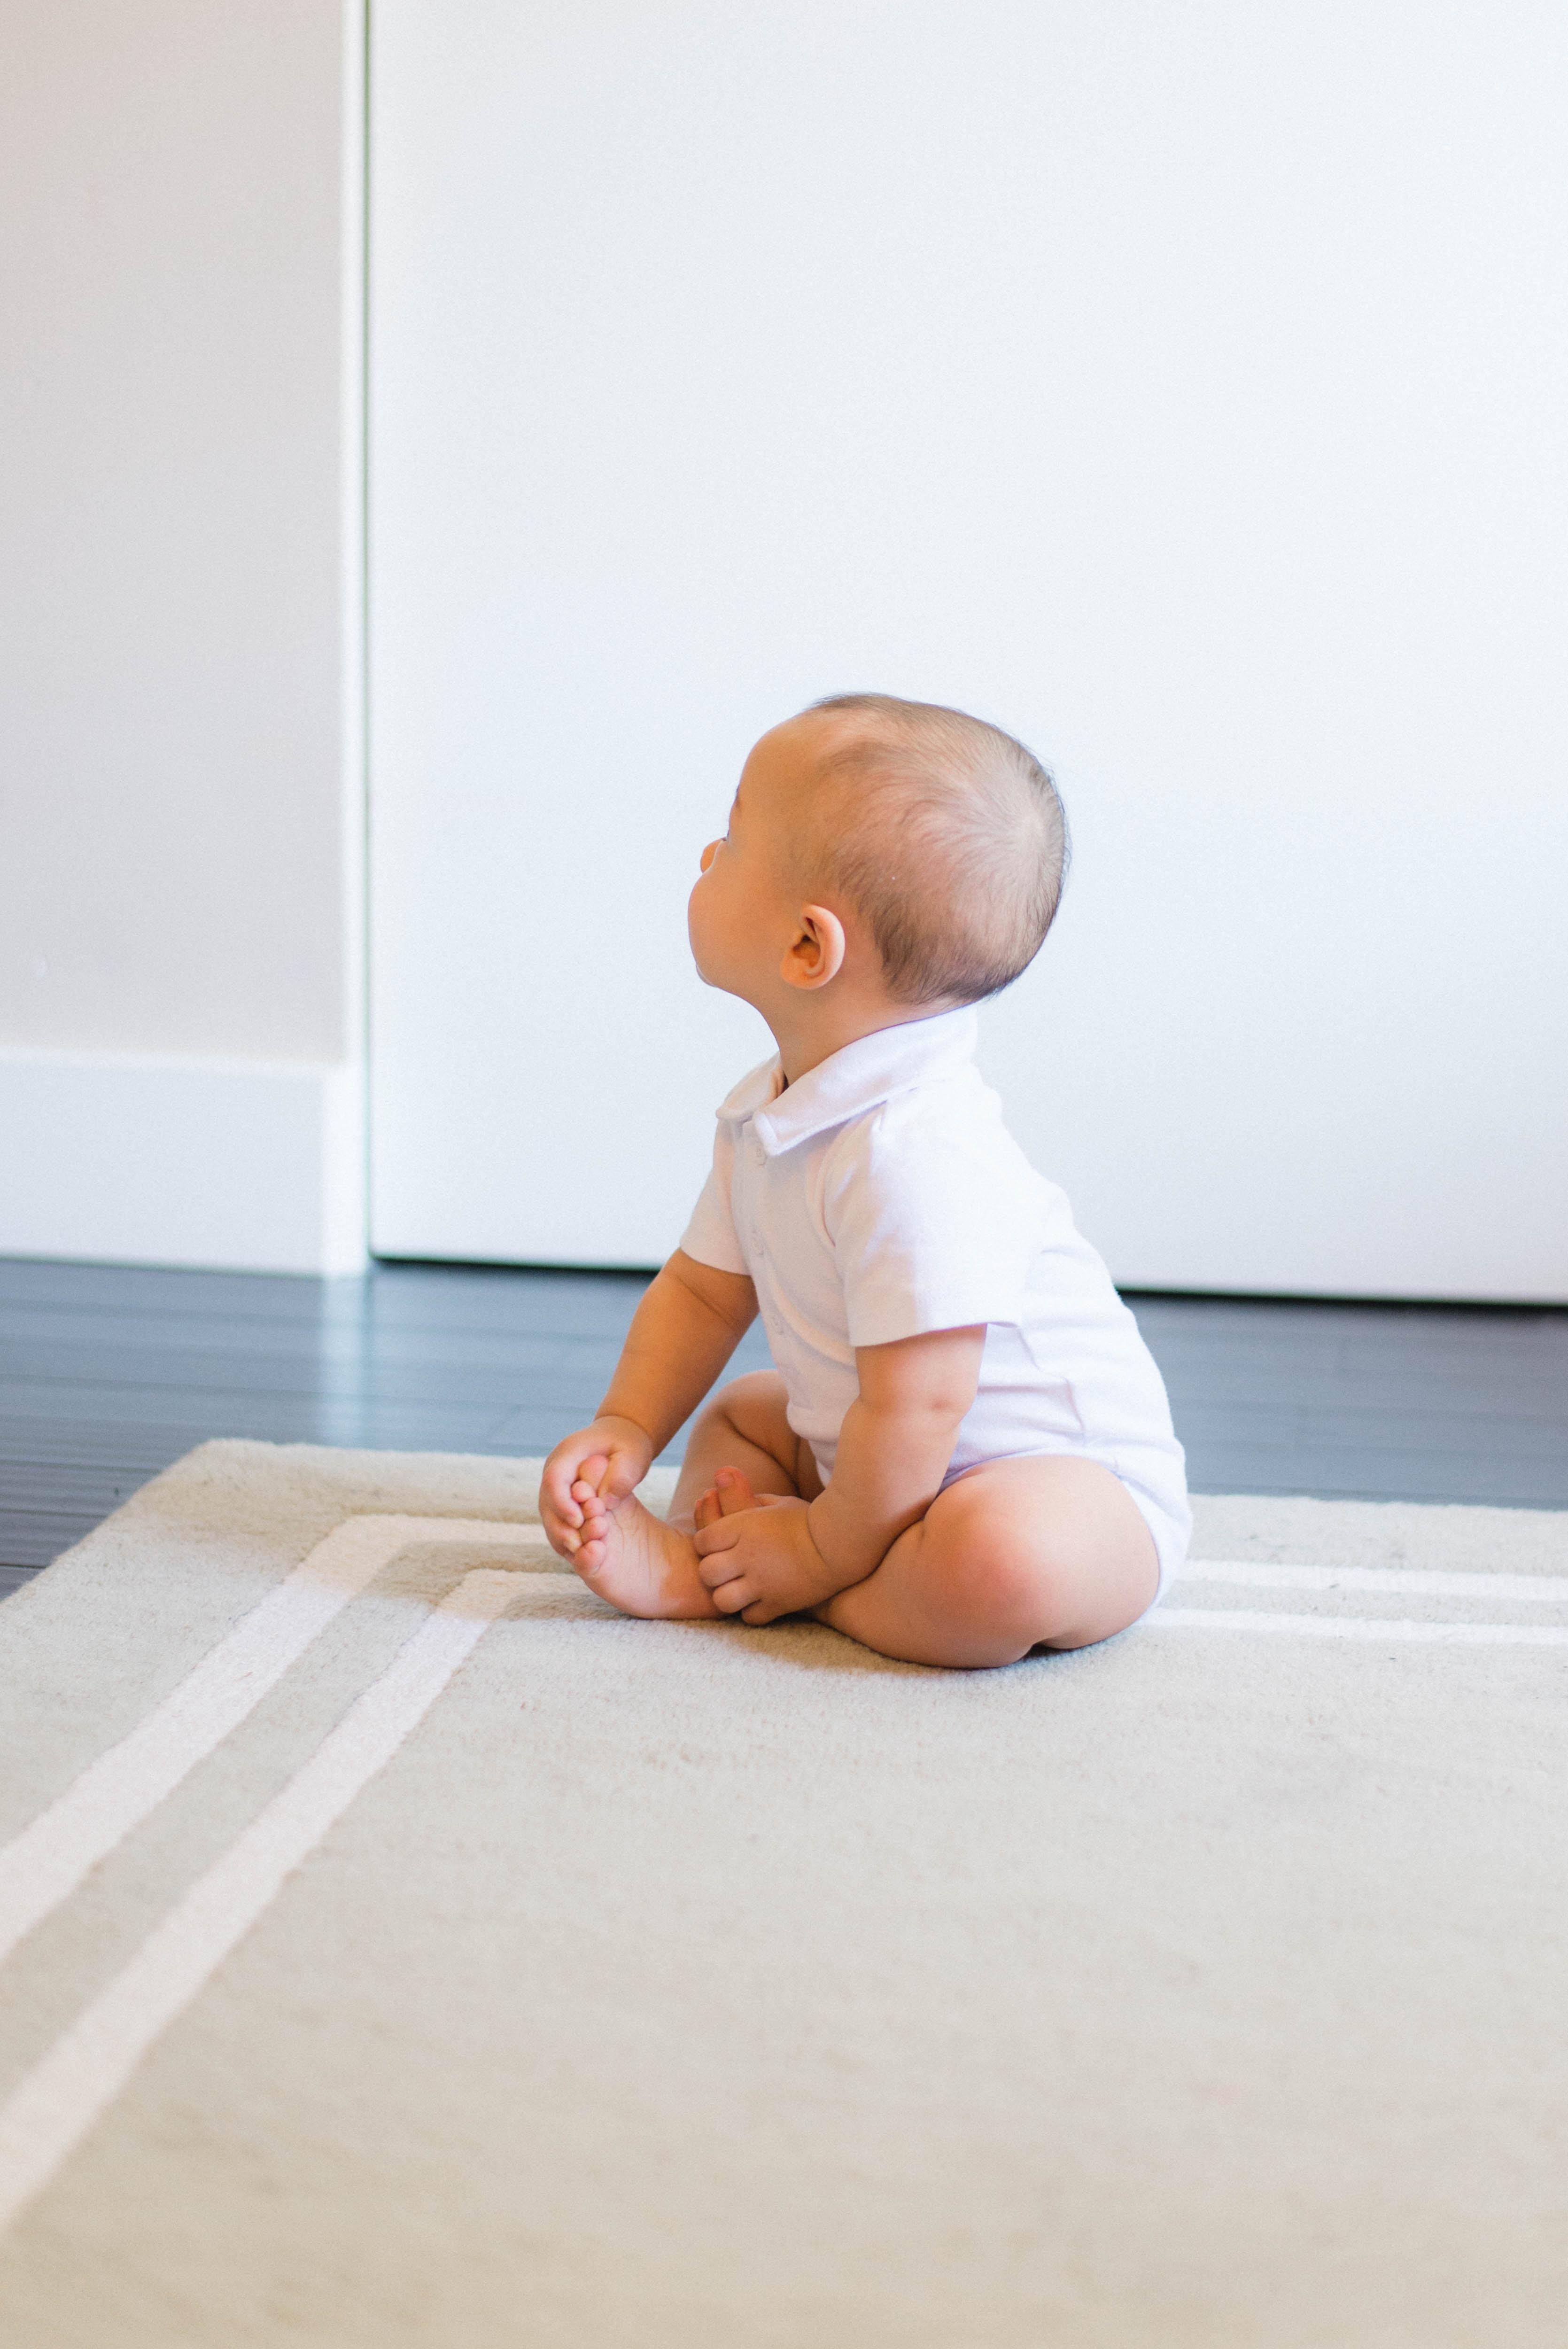 baby sitting on beige rug